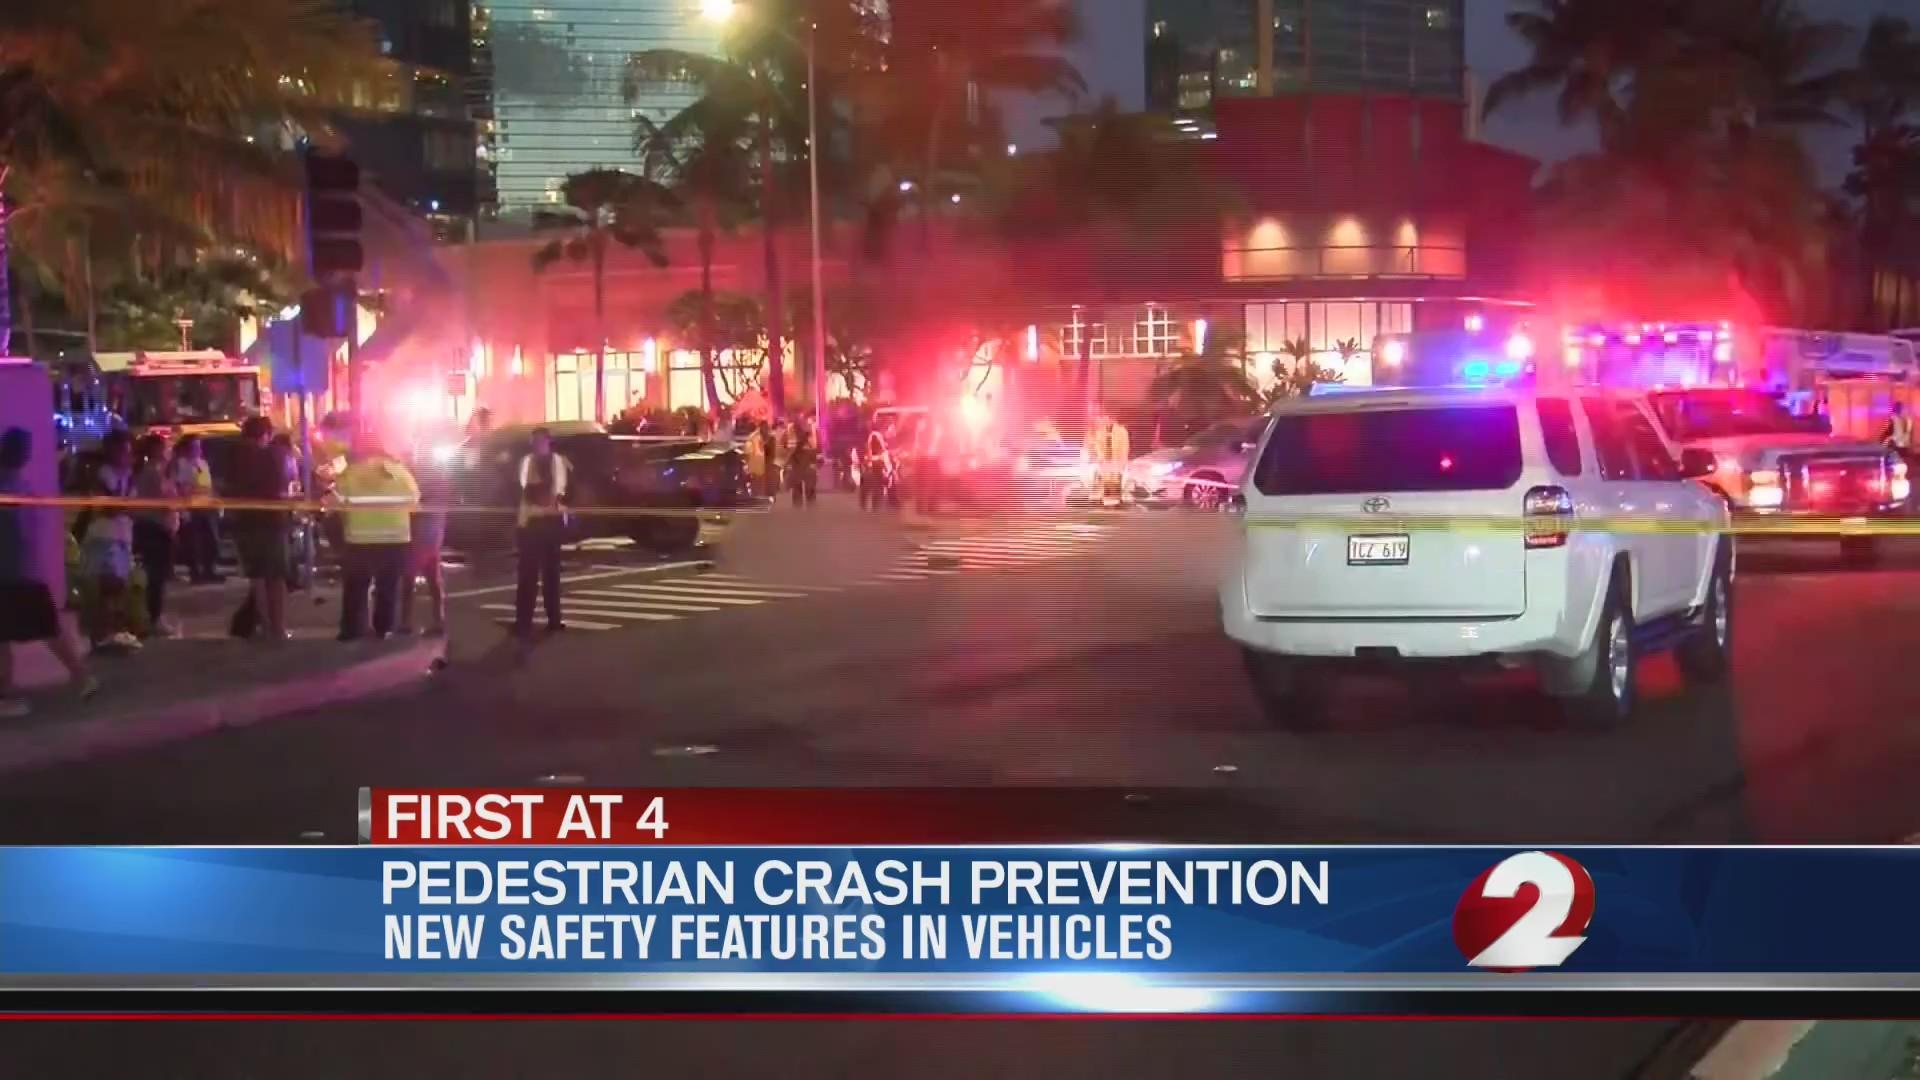 Pedestrian crash prevention